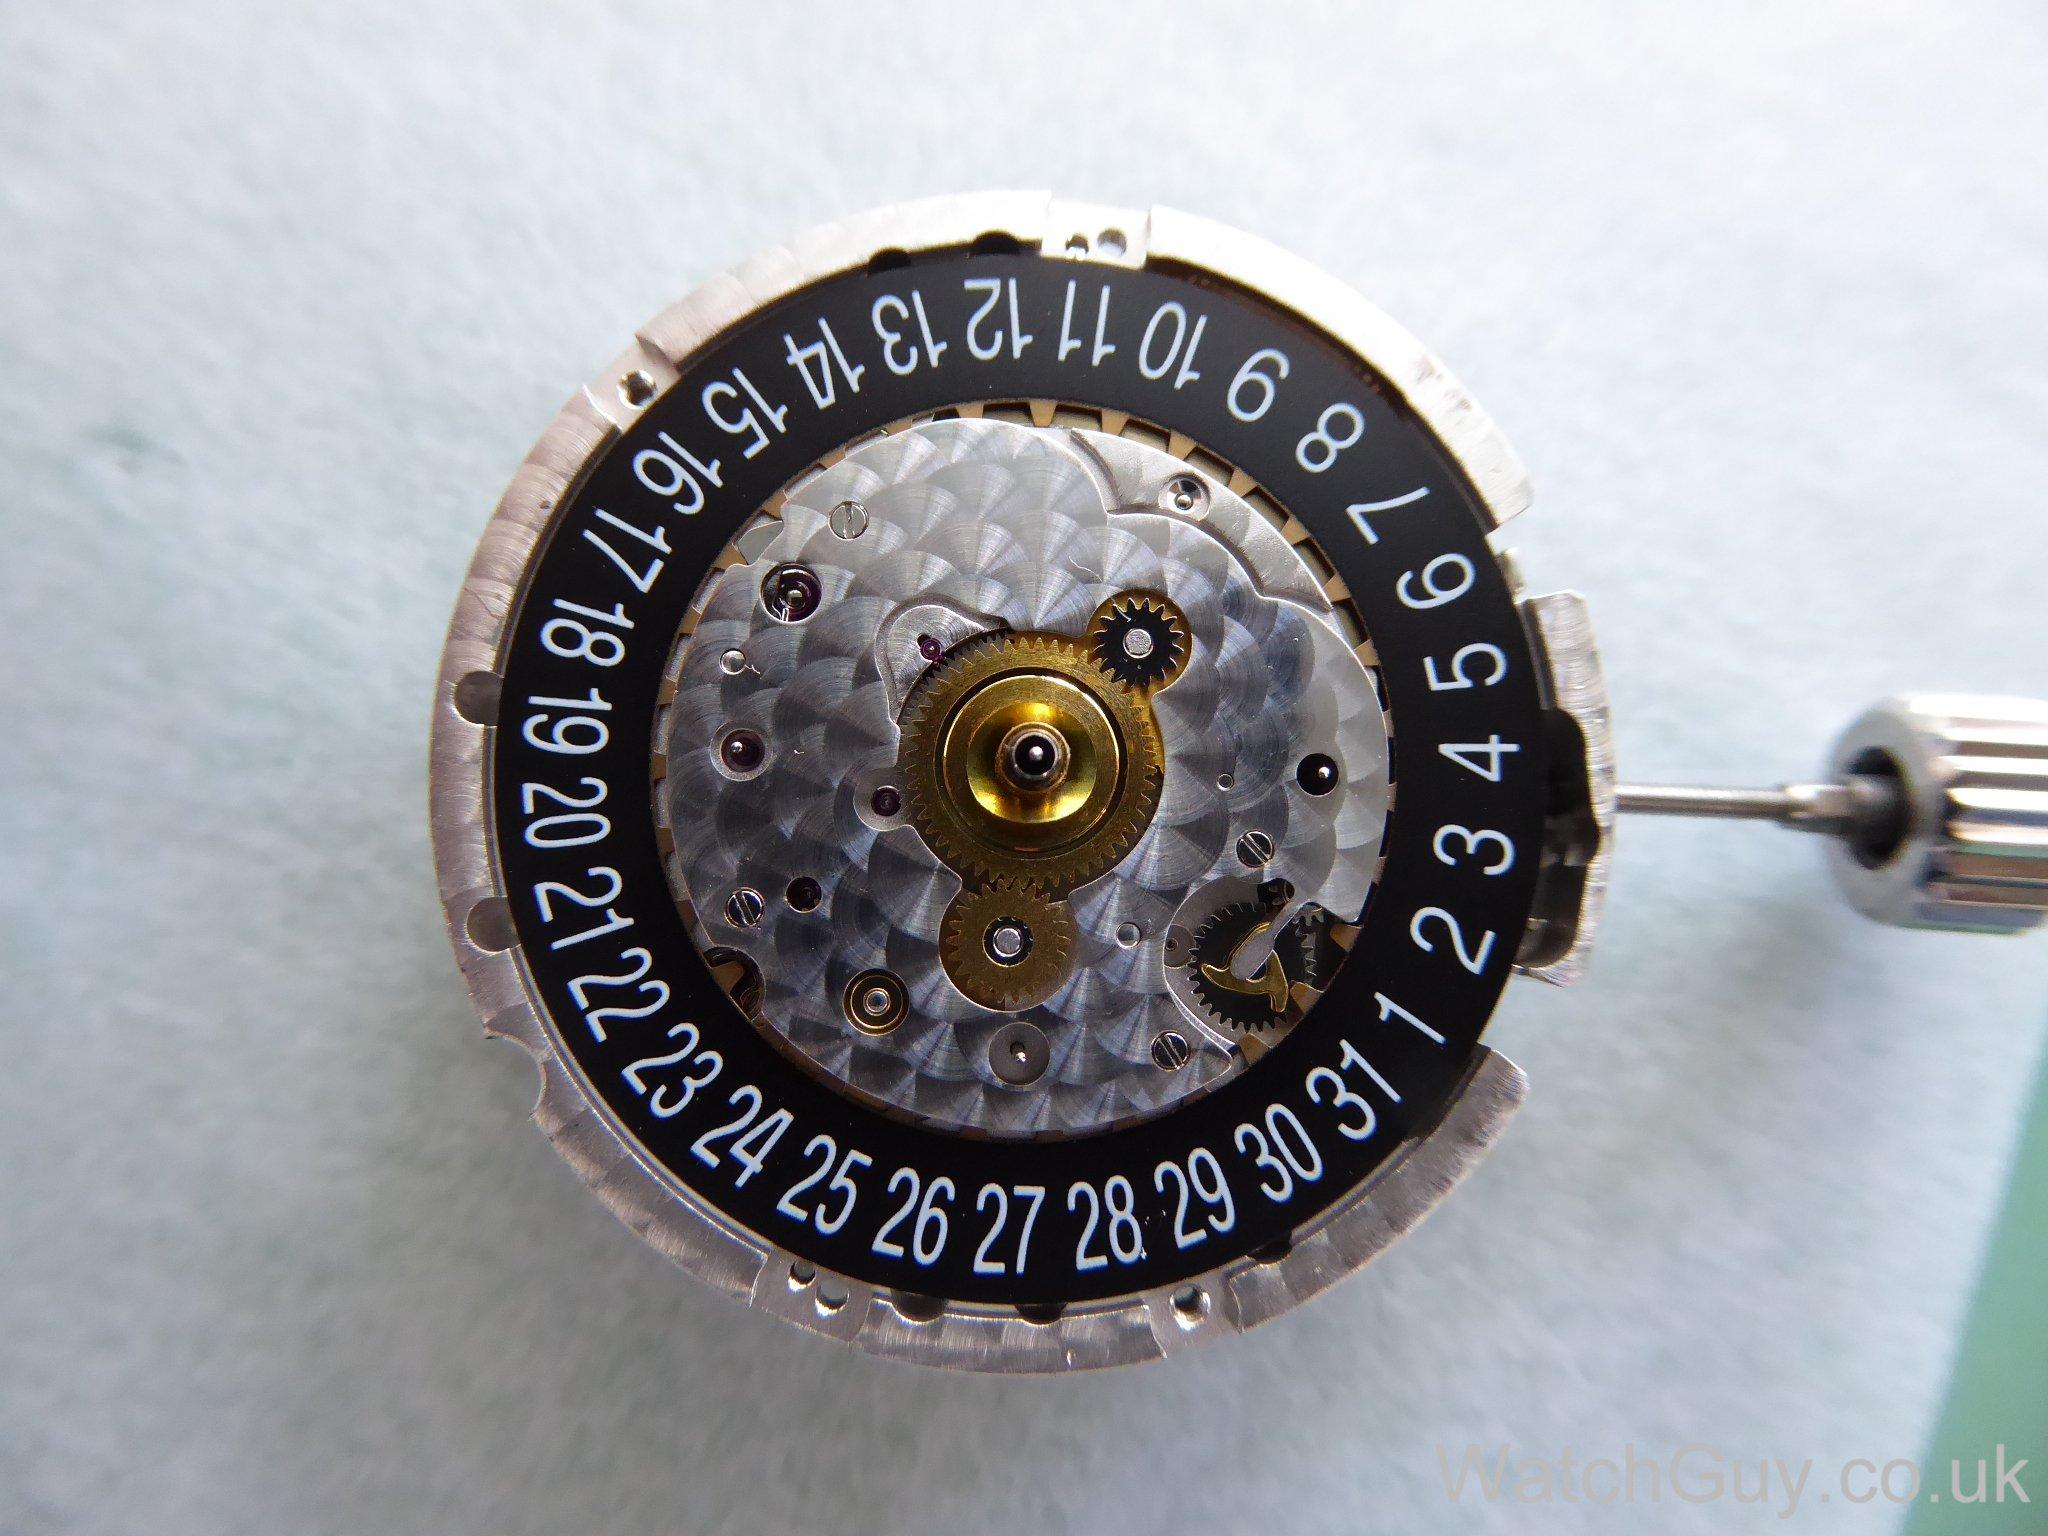 omega - photos du calibre omega 3303 P1060153